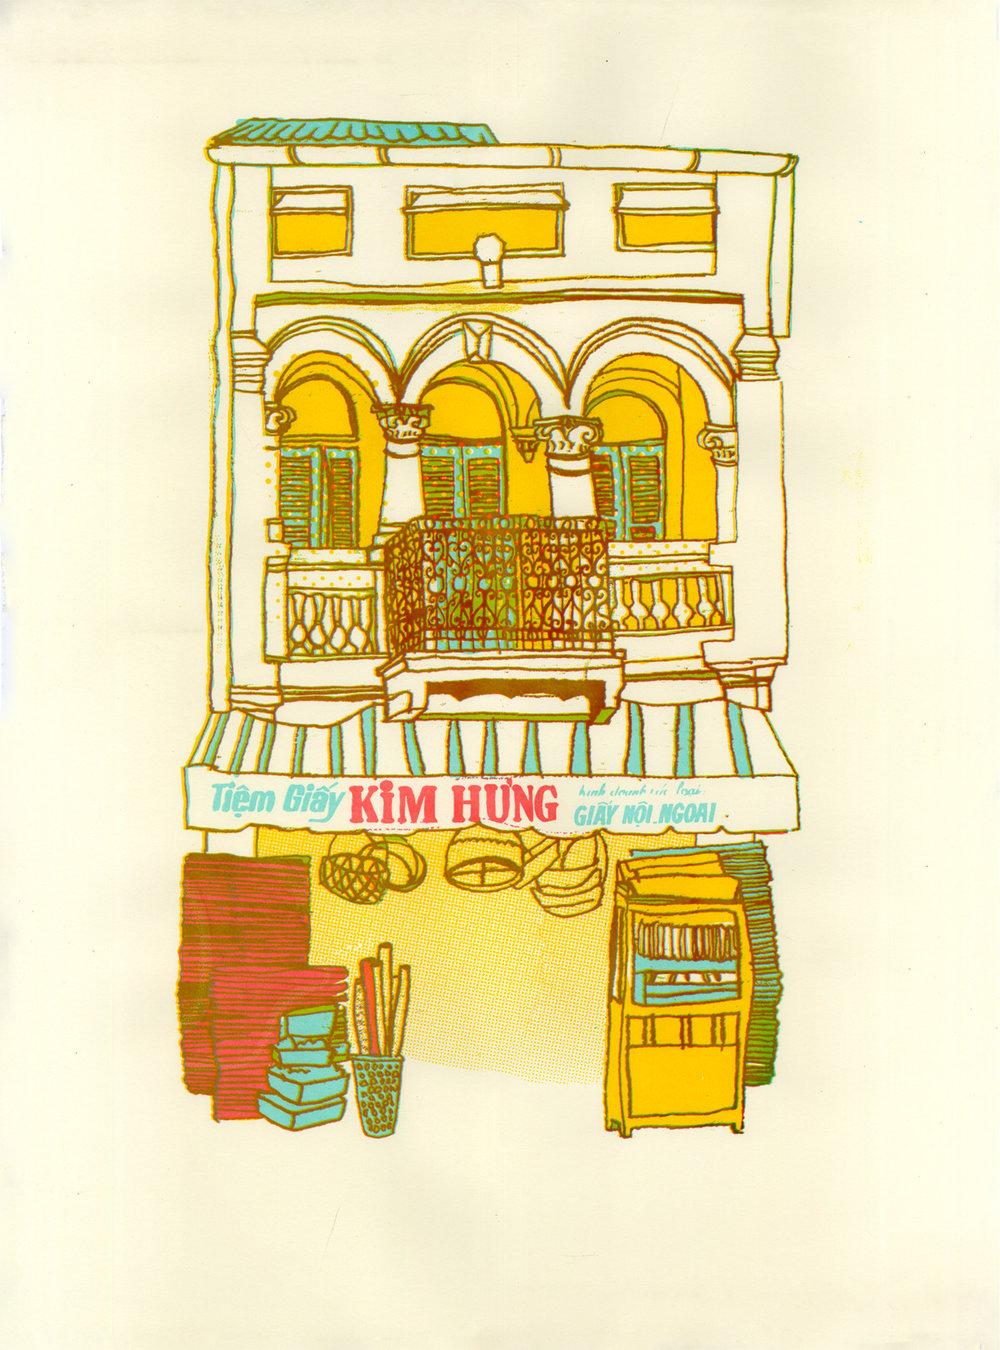 Kim Hung